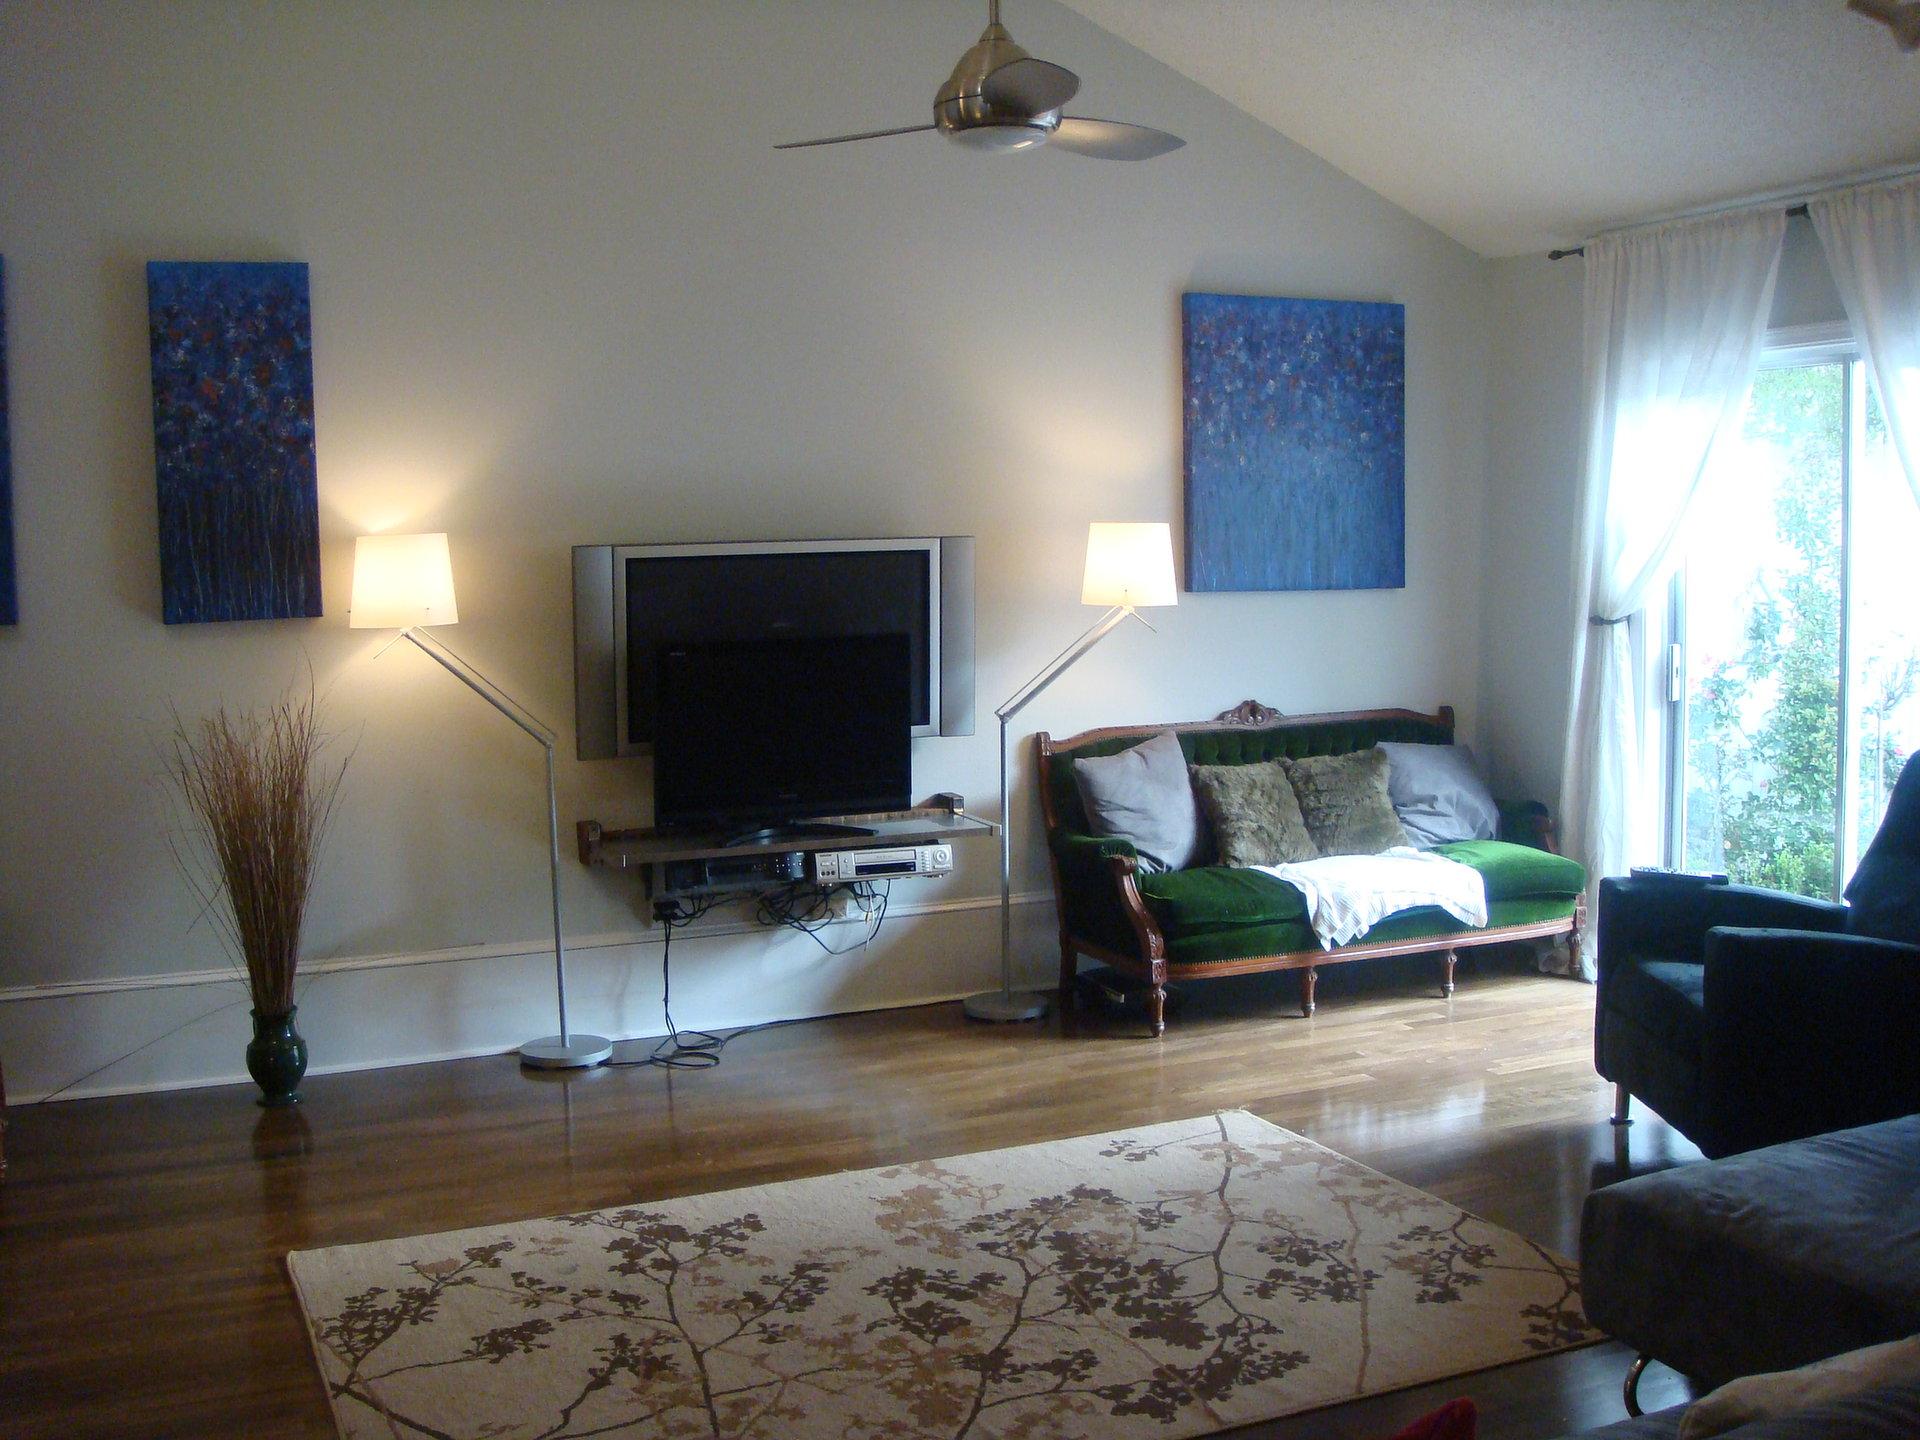 311+Calhoun+living+room+2.JPG